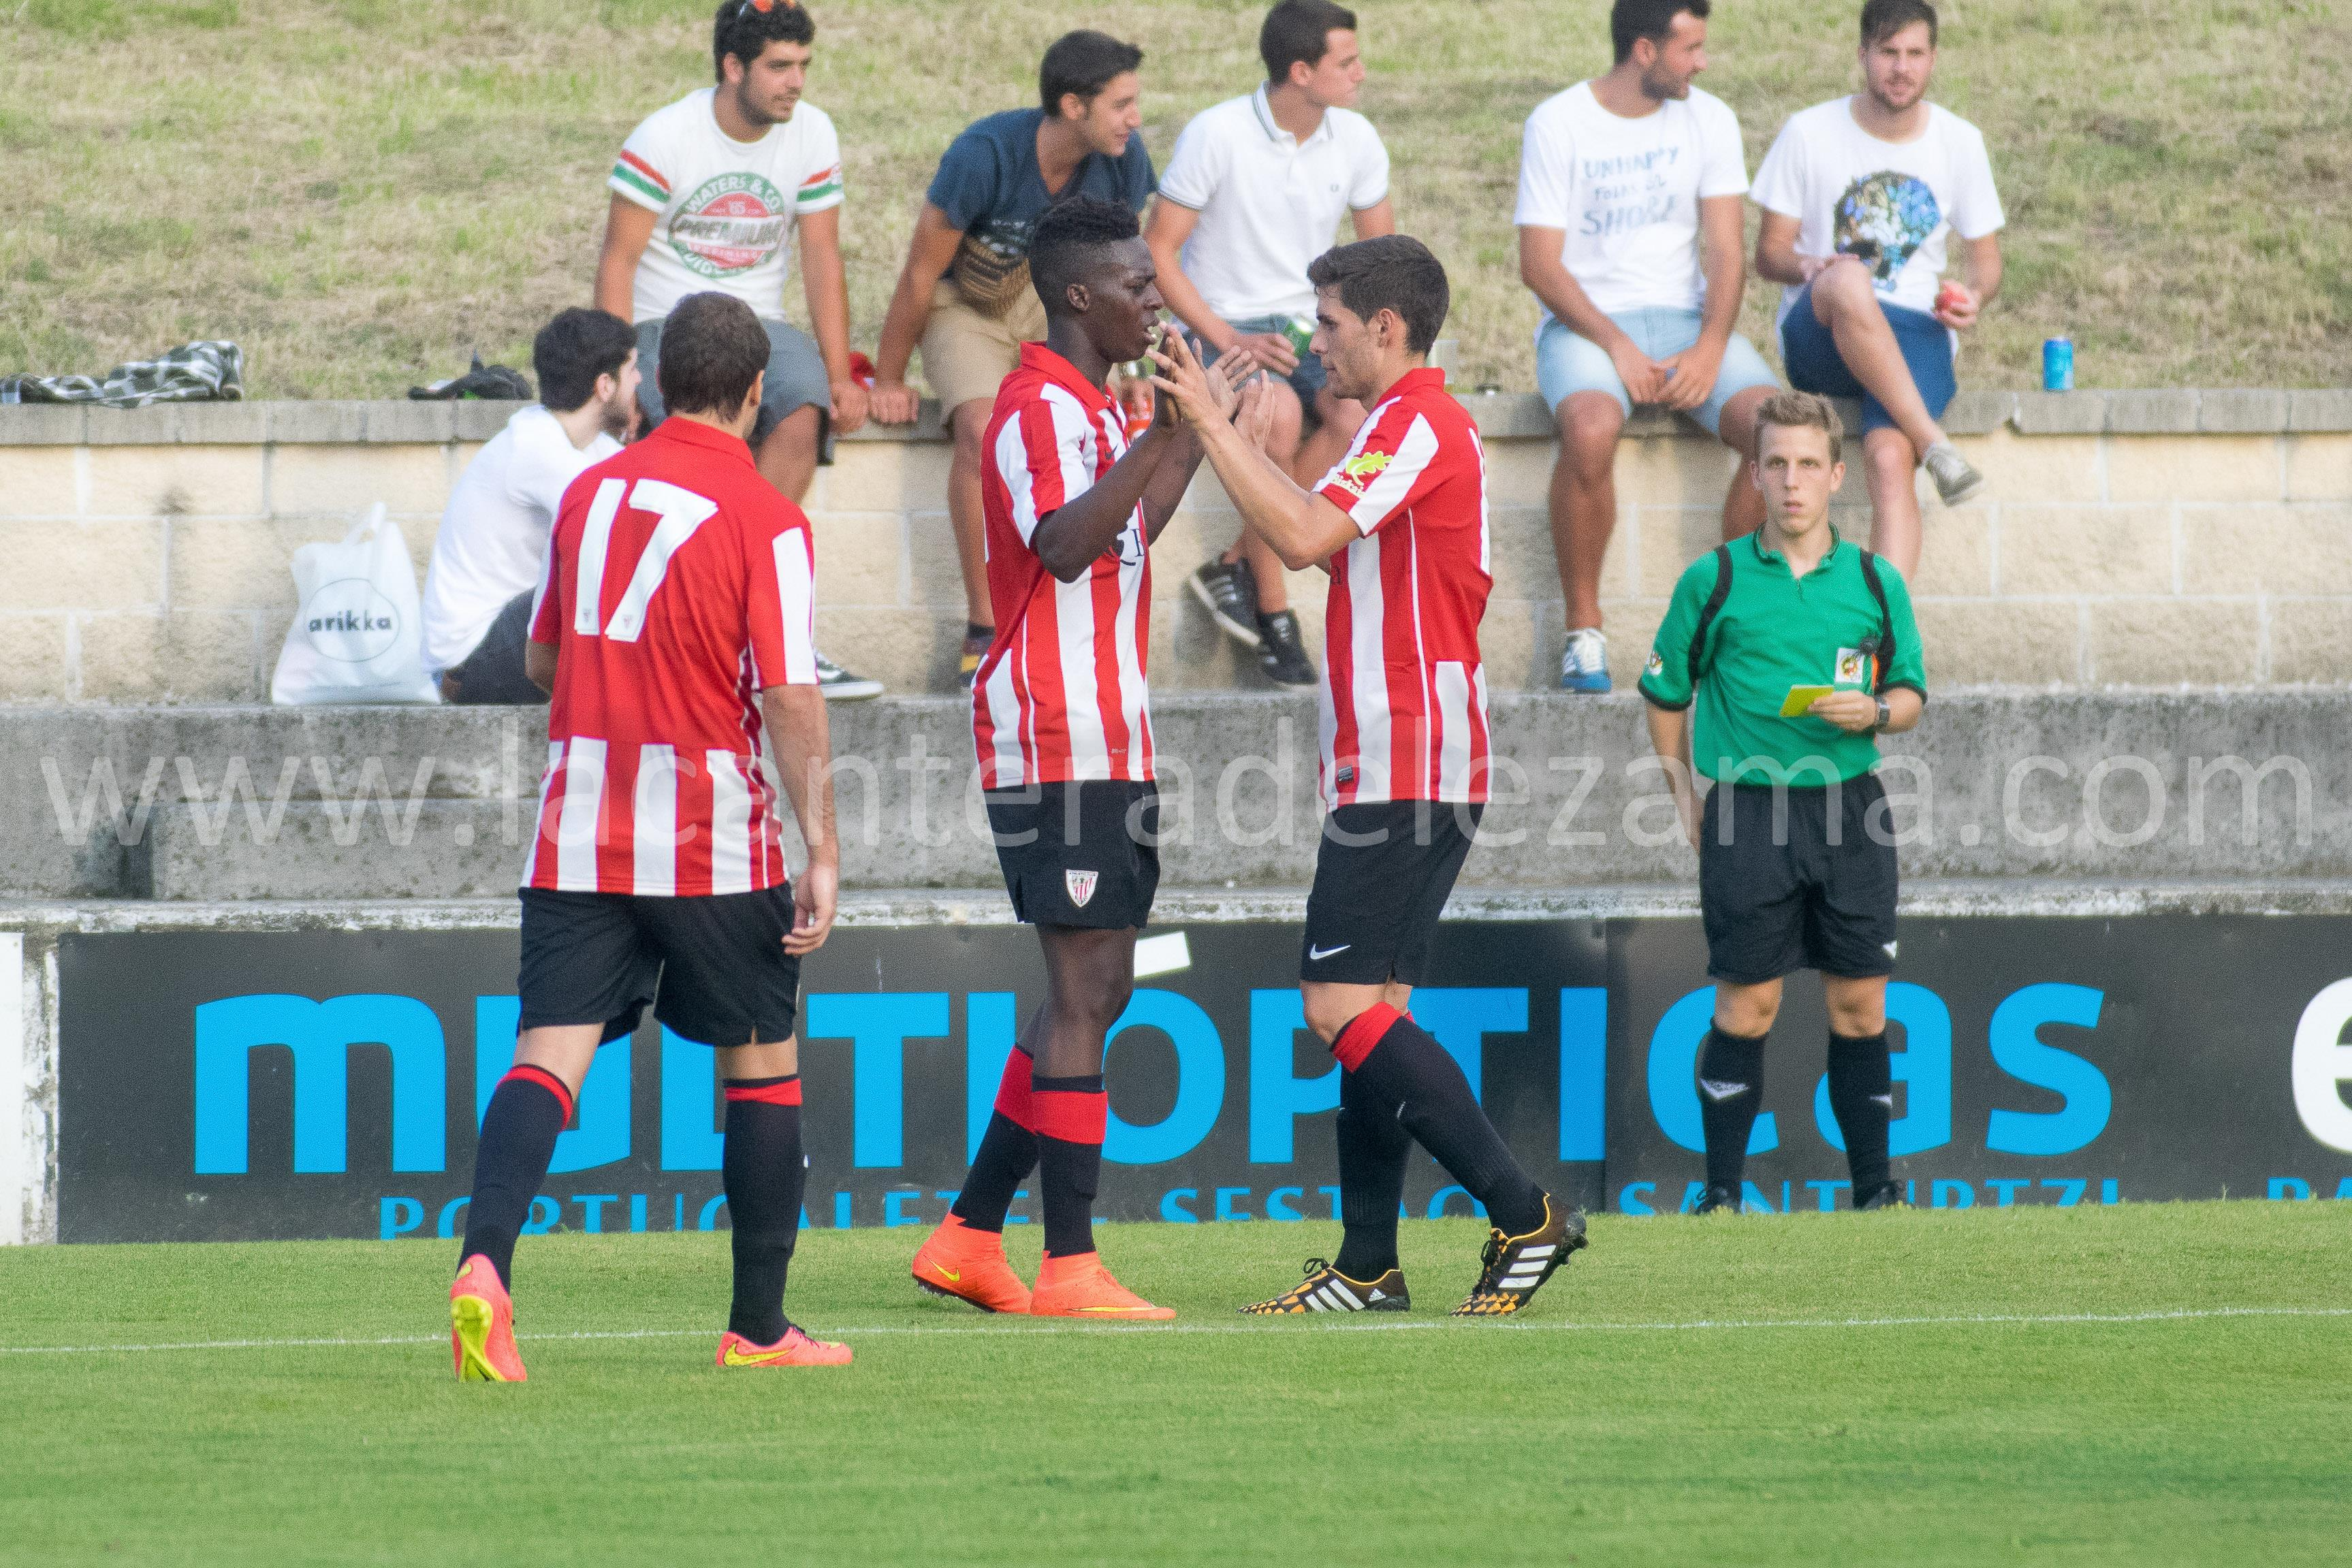 Celebración del segundo gol | Foto: Unai Zabaleta